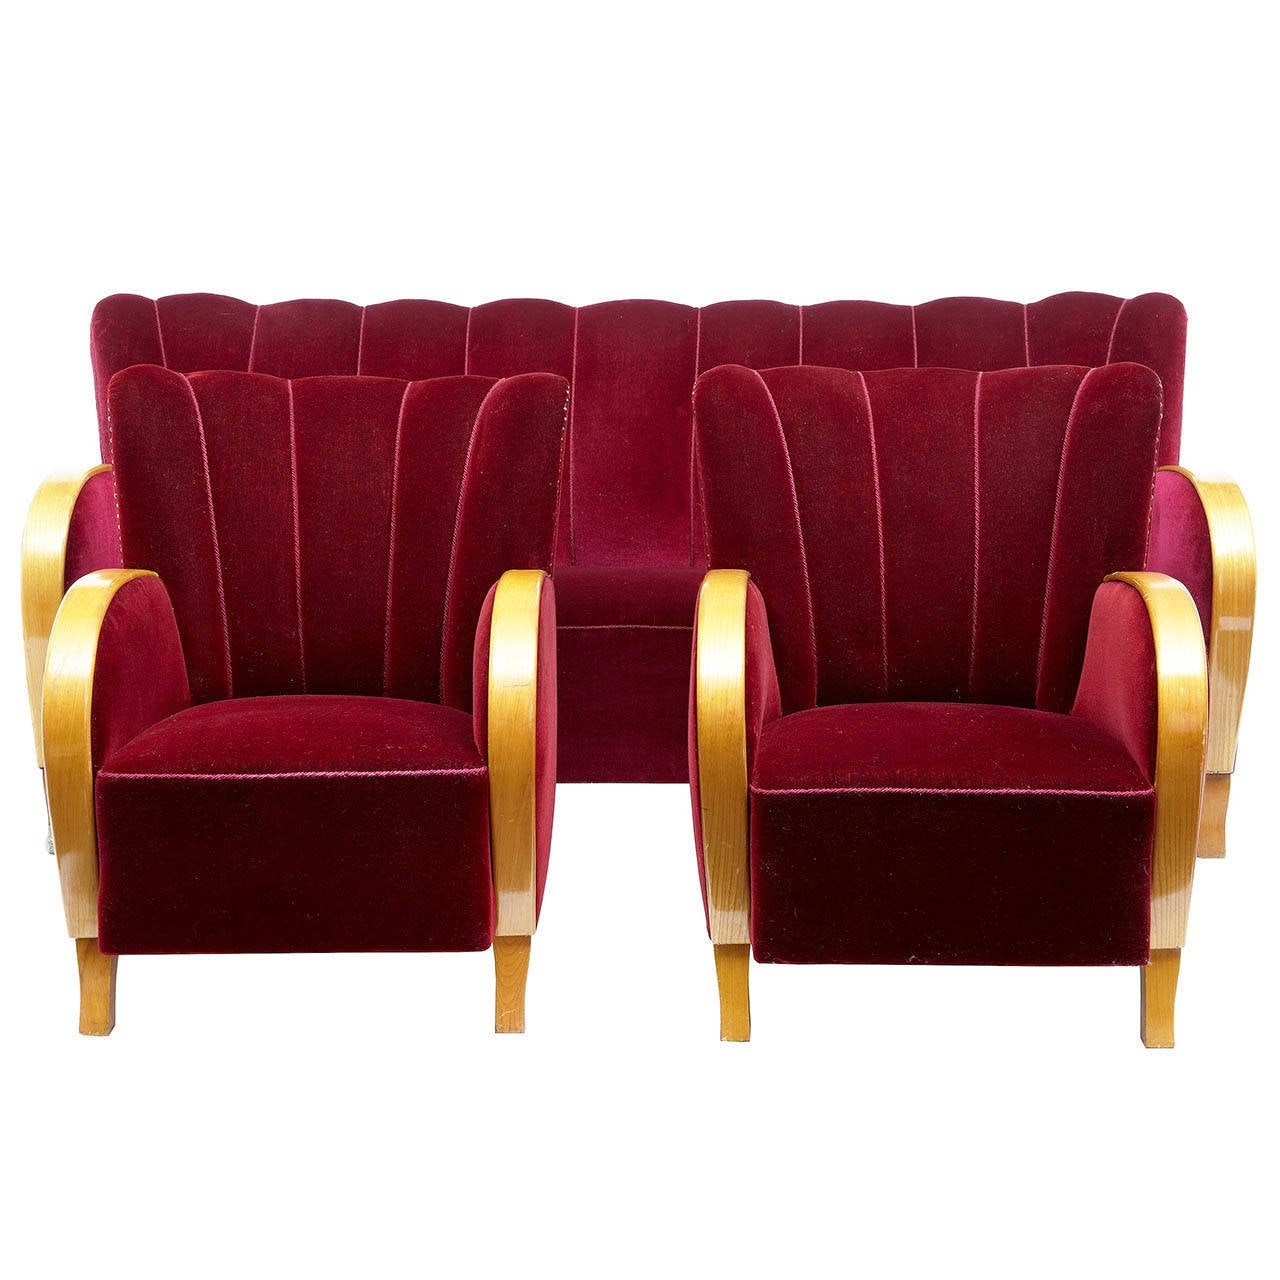 Retro Living Room Furniture Sets: 1960s Retro Modern Shell Back, Three-Piece Suite Of Sofa